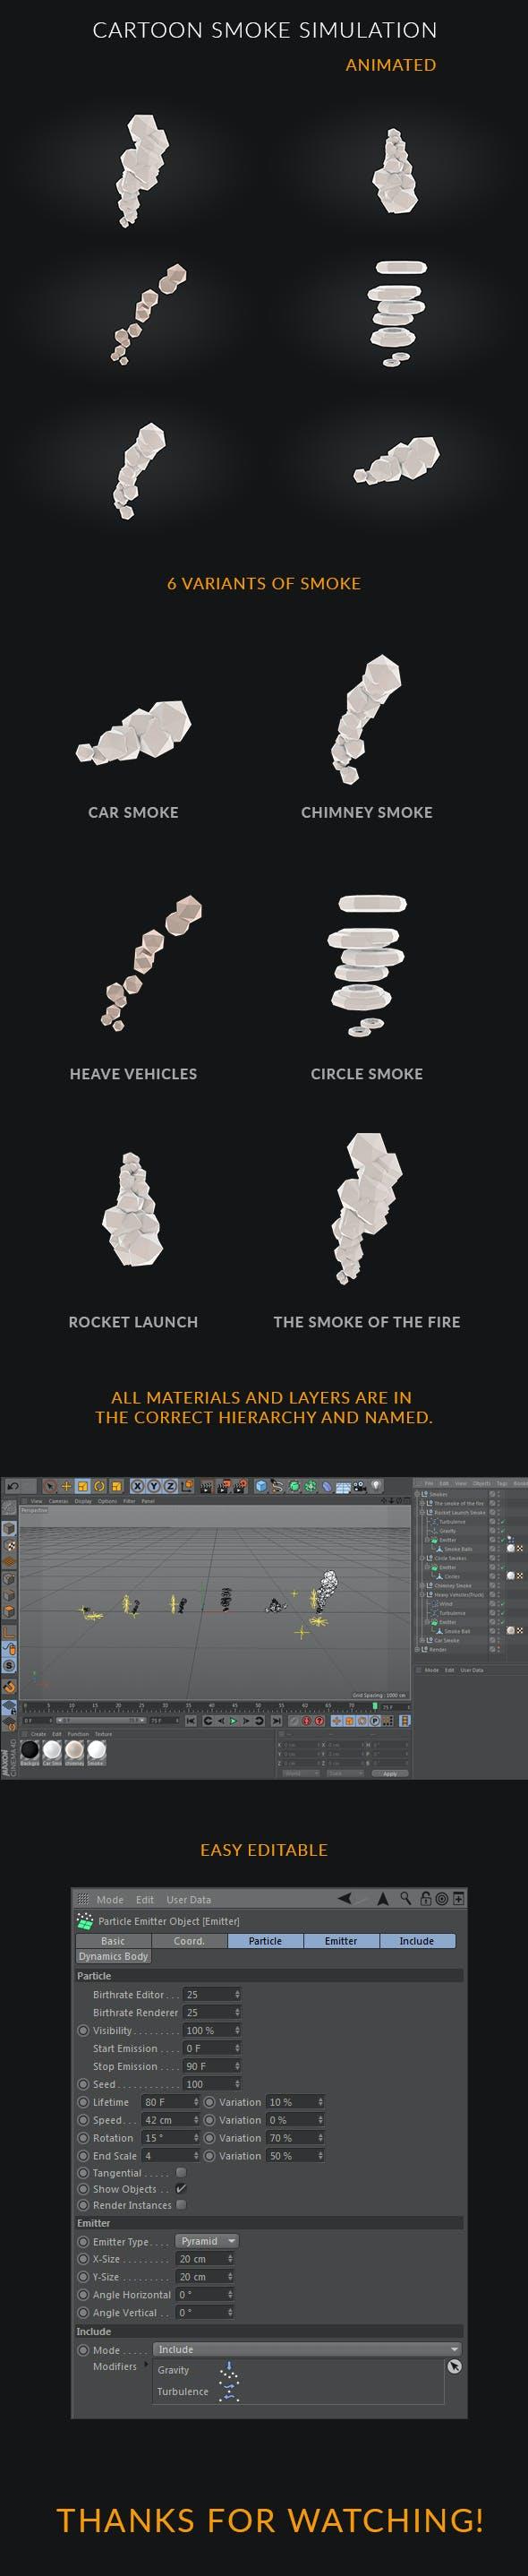 6 Cartoon Smoke Simulation - 3DOcean Item for Sale